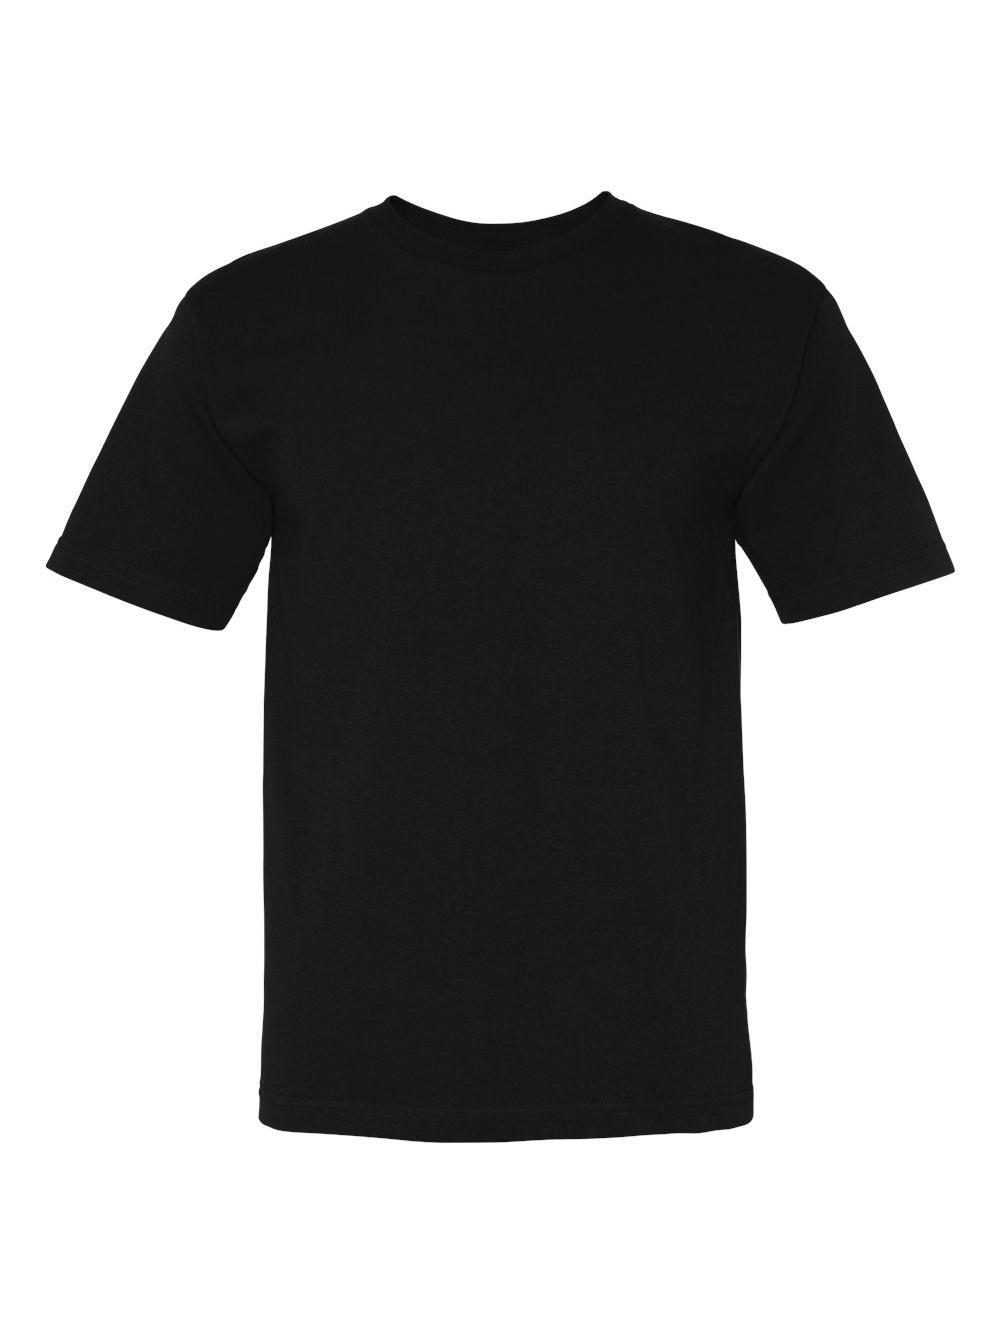 Bayside-USA-Made-100-Cotton-Short-Sleeve-T-Shirt-5040 thumbnail 3